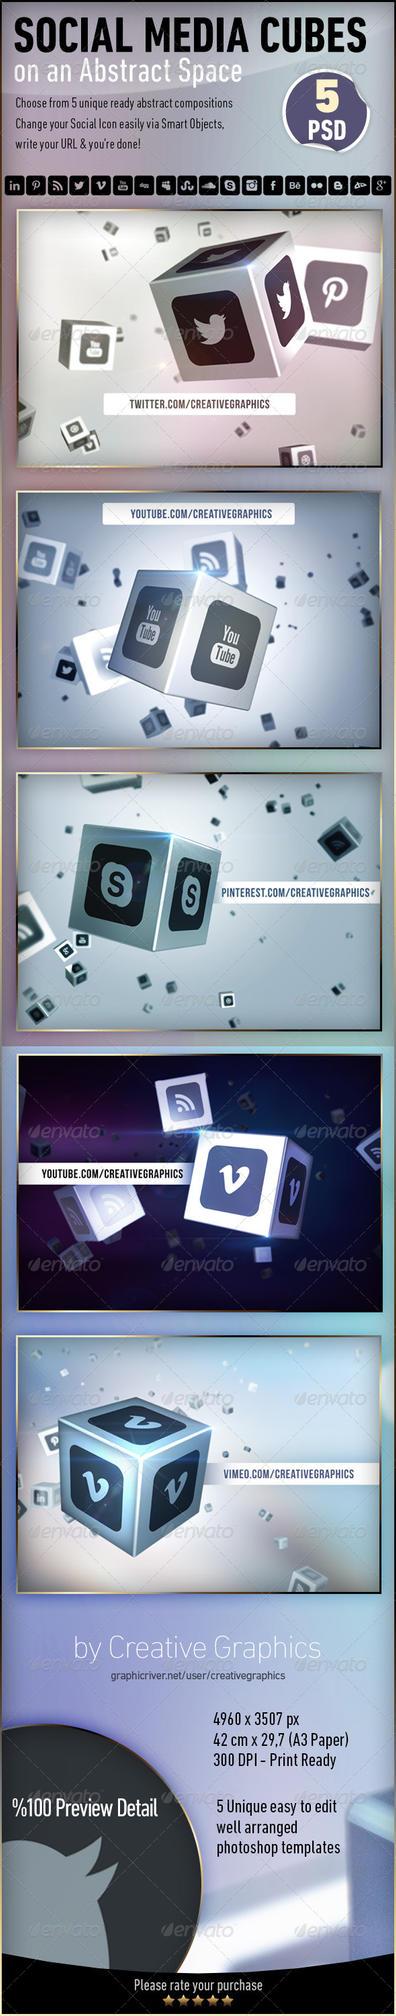 Social Media Cube by Grasycho